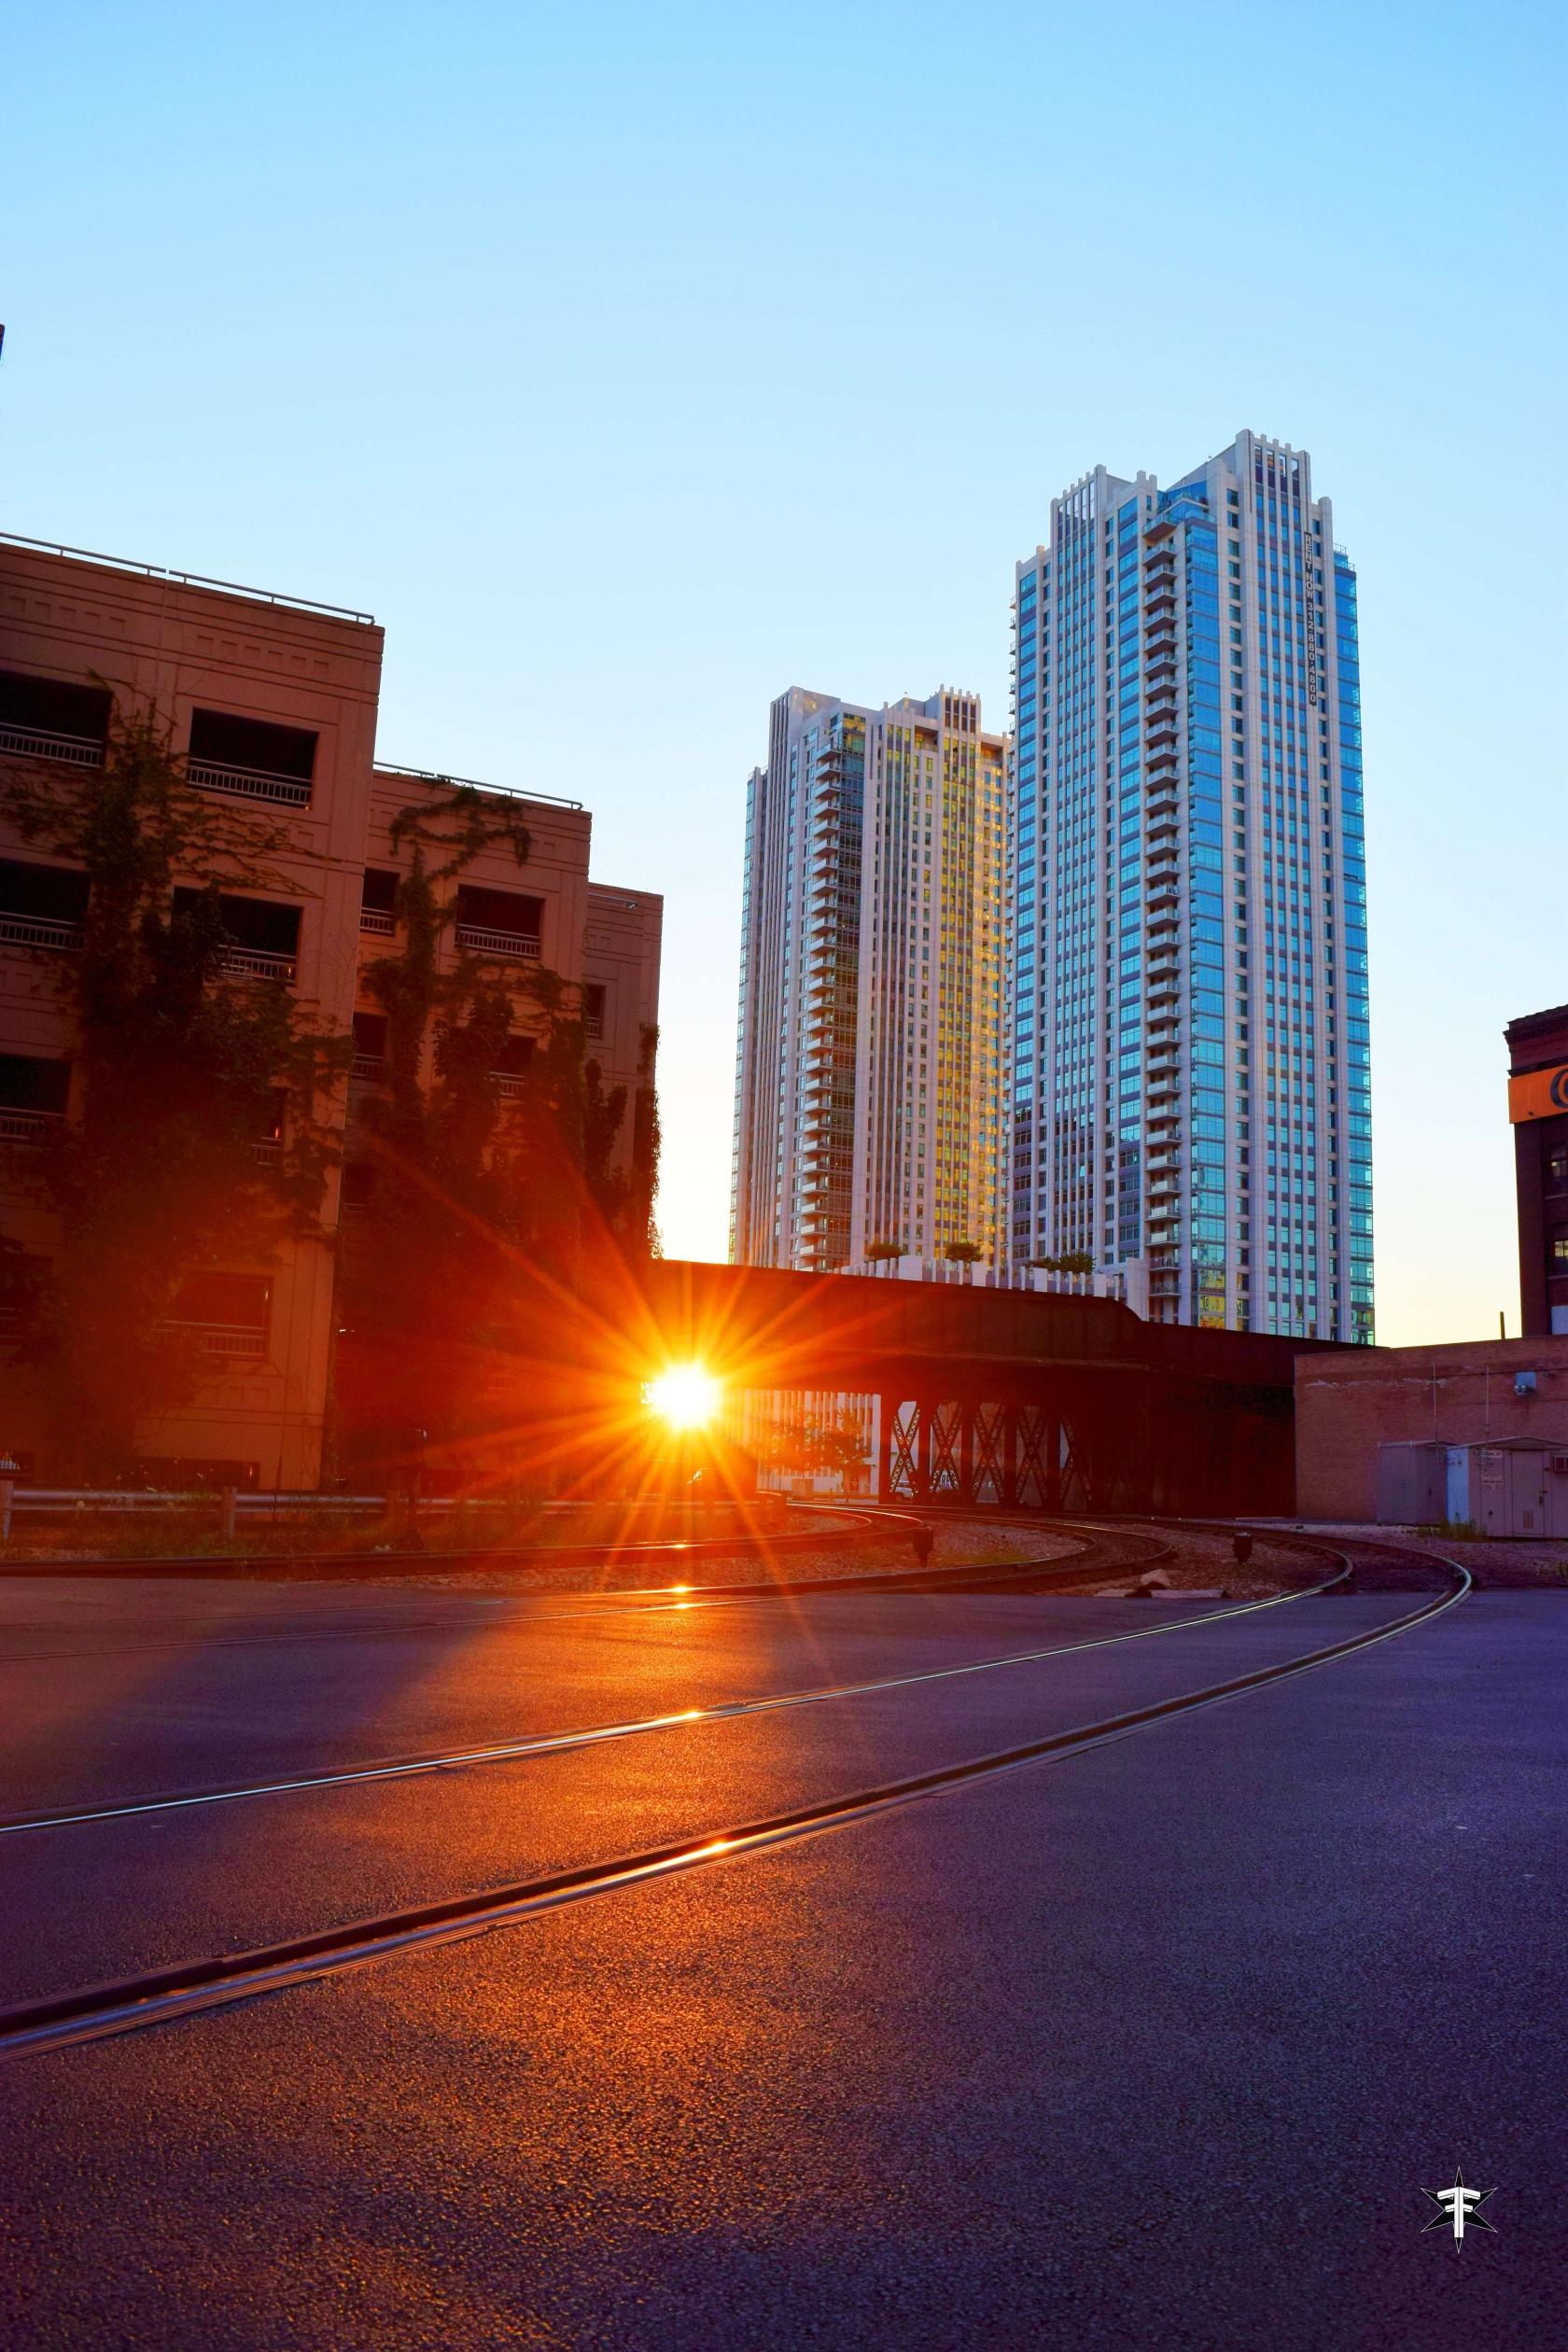 batch_sunset chicago sun architecture bridge light art light color.jpg